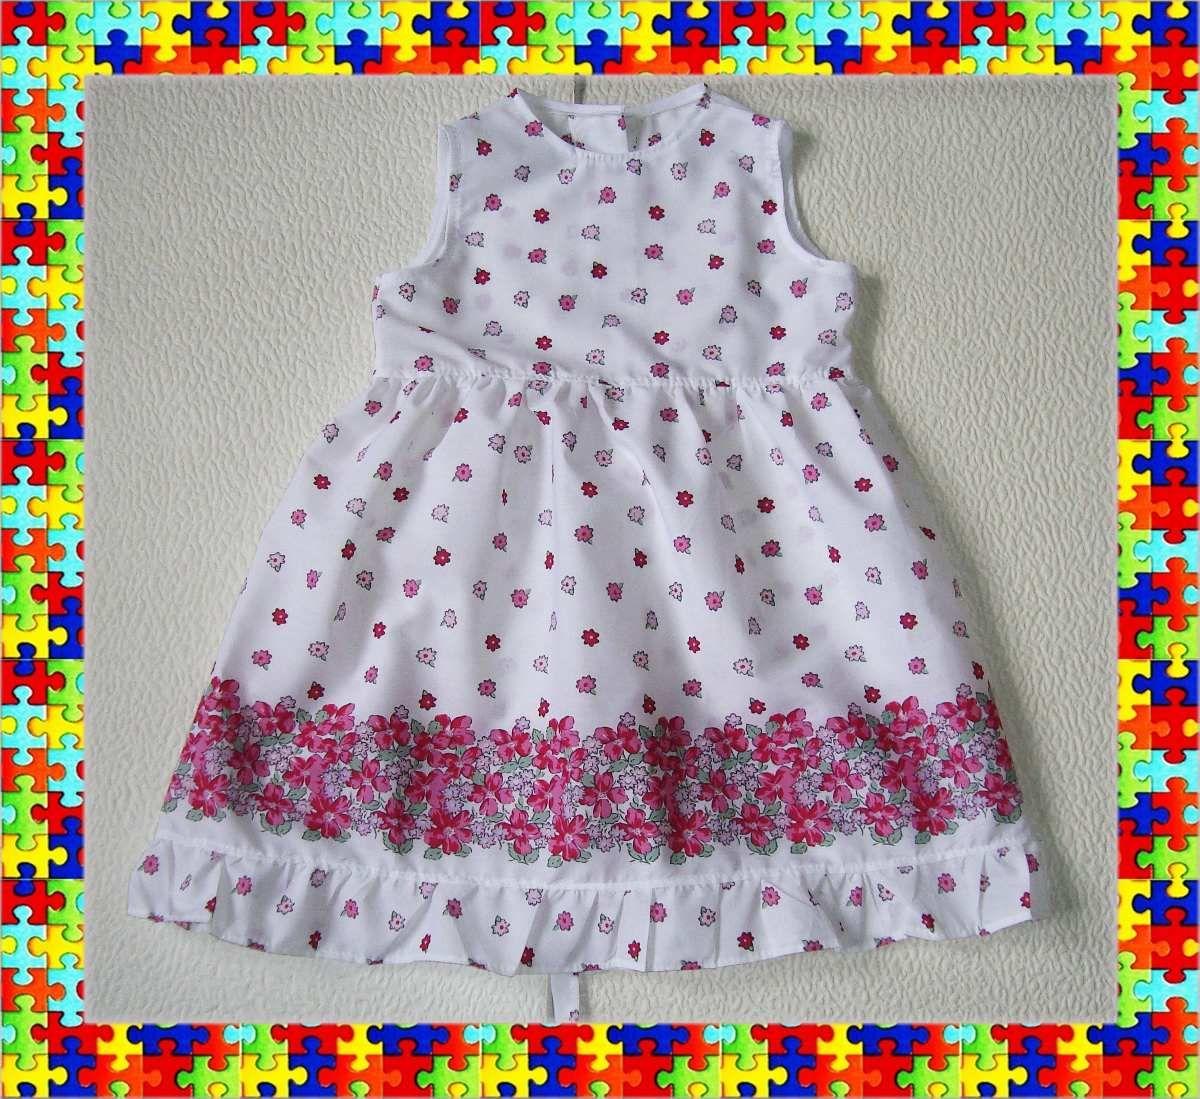 b0f6cb6a8 Vestido De Nena Talles 2 Al 10 - $ 330,00 en MercadoLibre ...